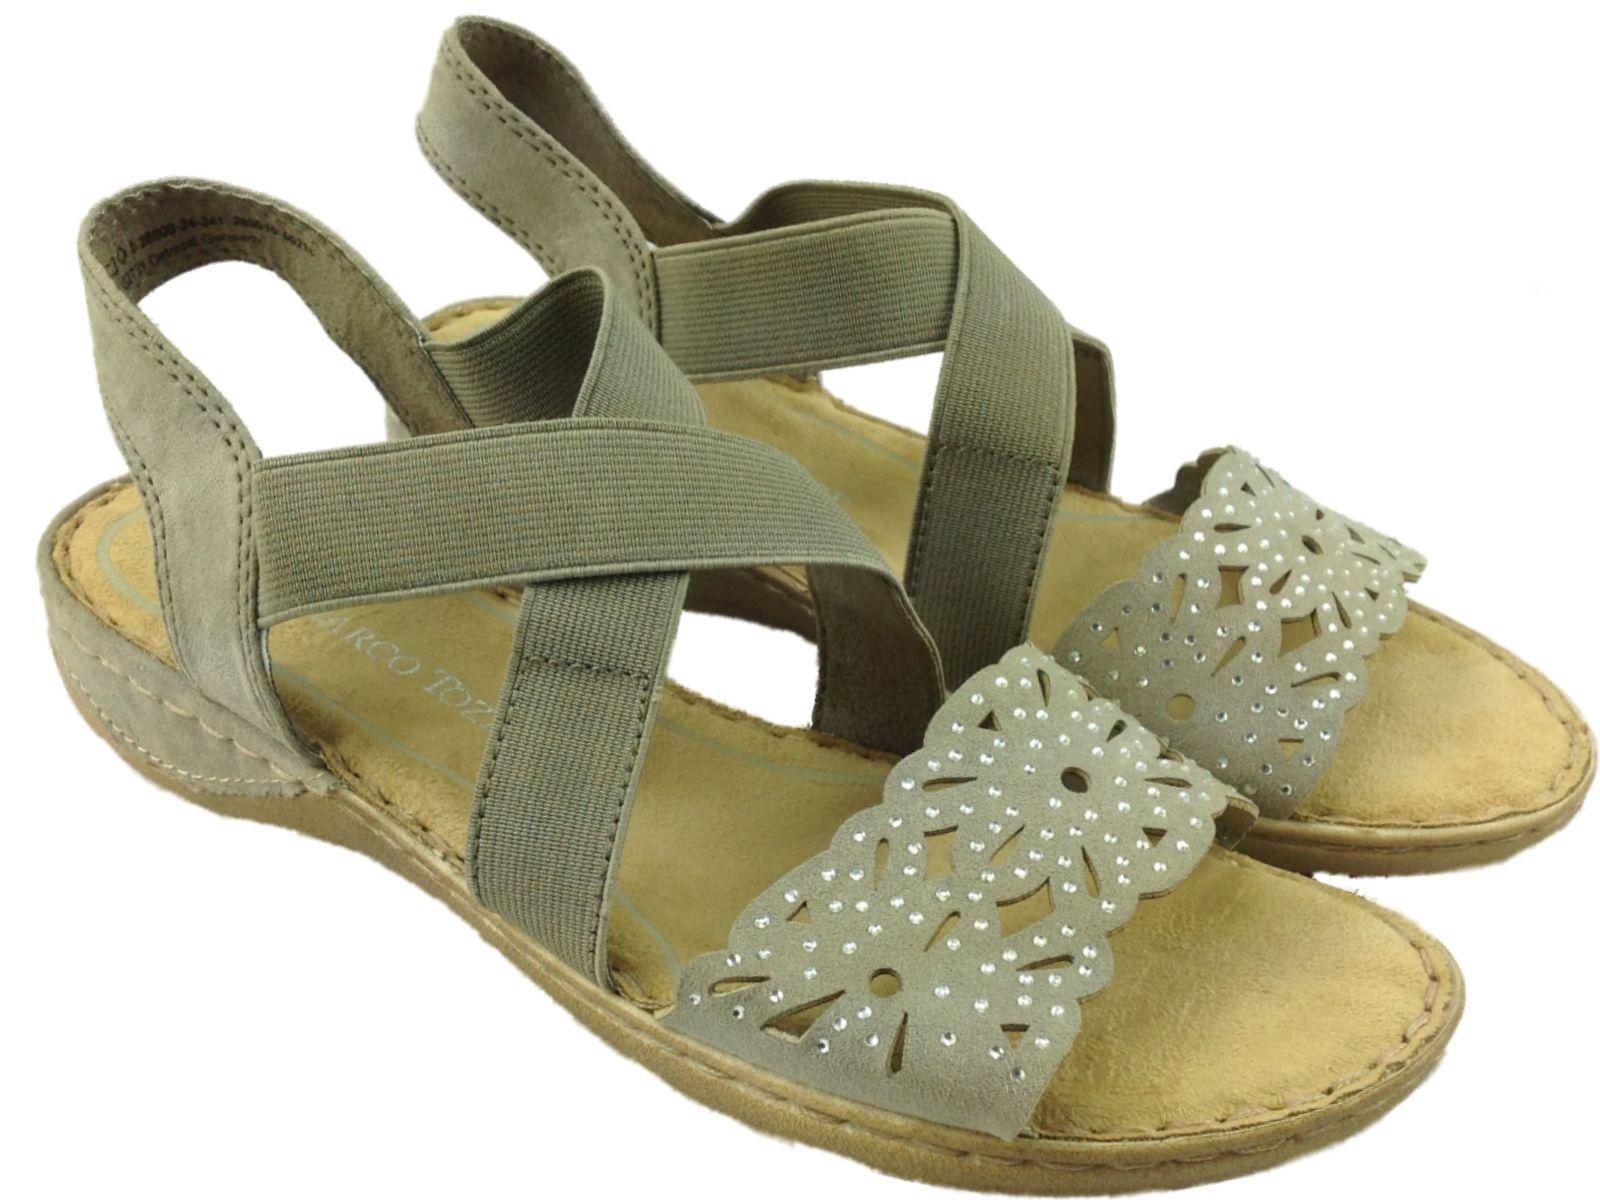 Ladies Marco Tozzi Elastic Strappy Slip On Taupe Gem Jewelled Wedge Sandal Shoe Jeweled Wedge Sandals Wedge Sandals Sandals